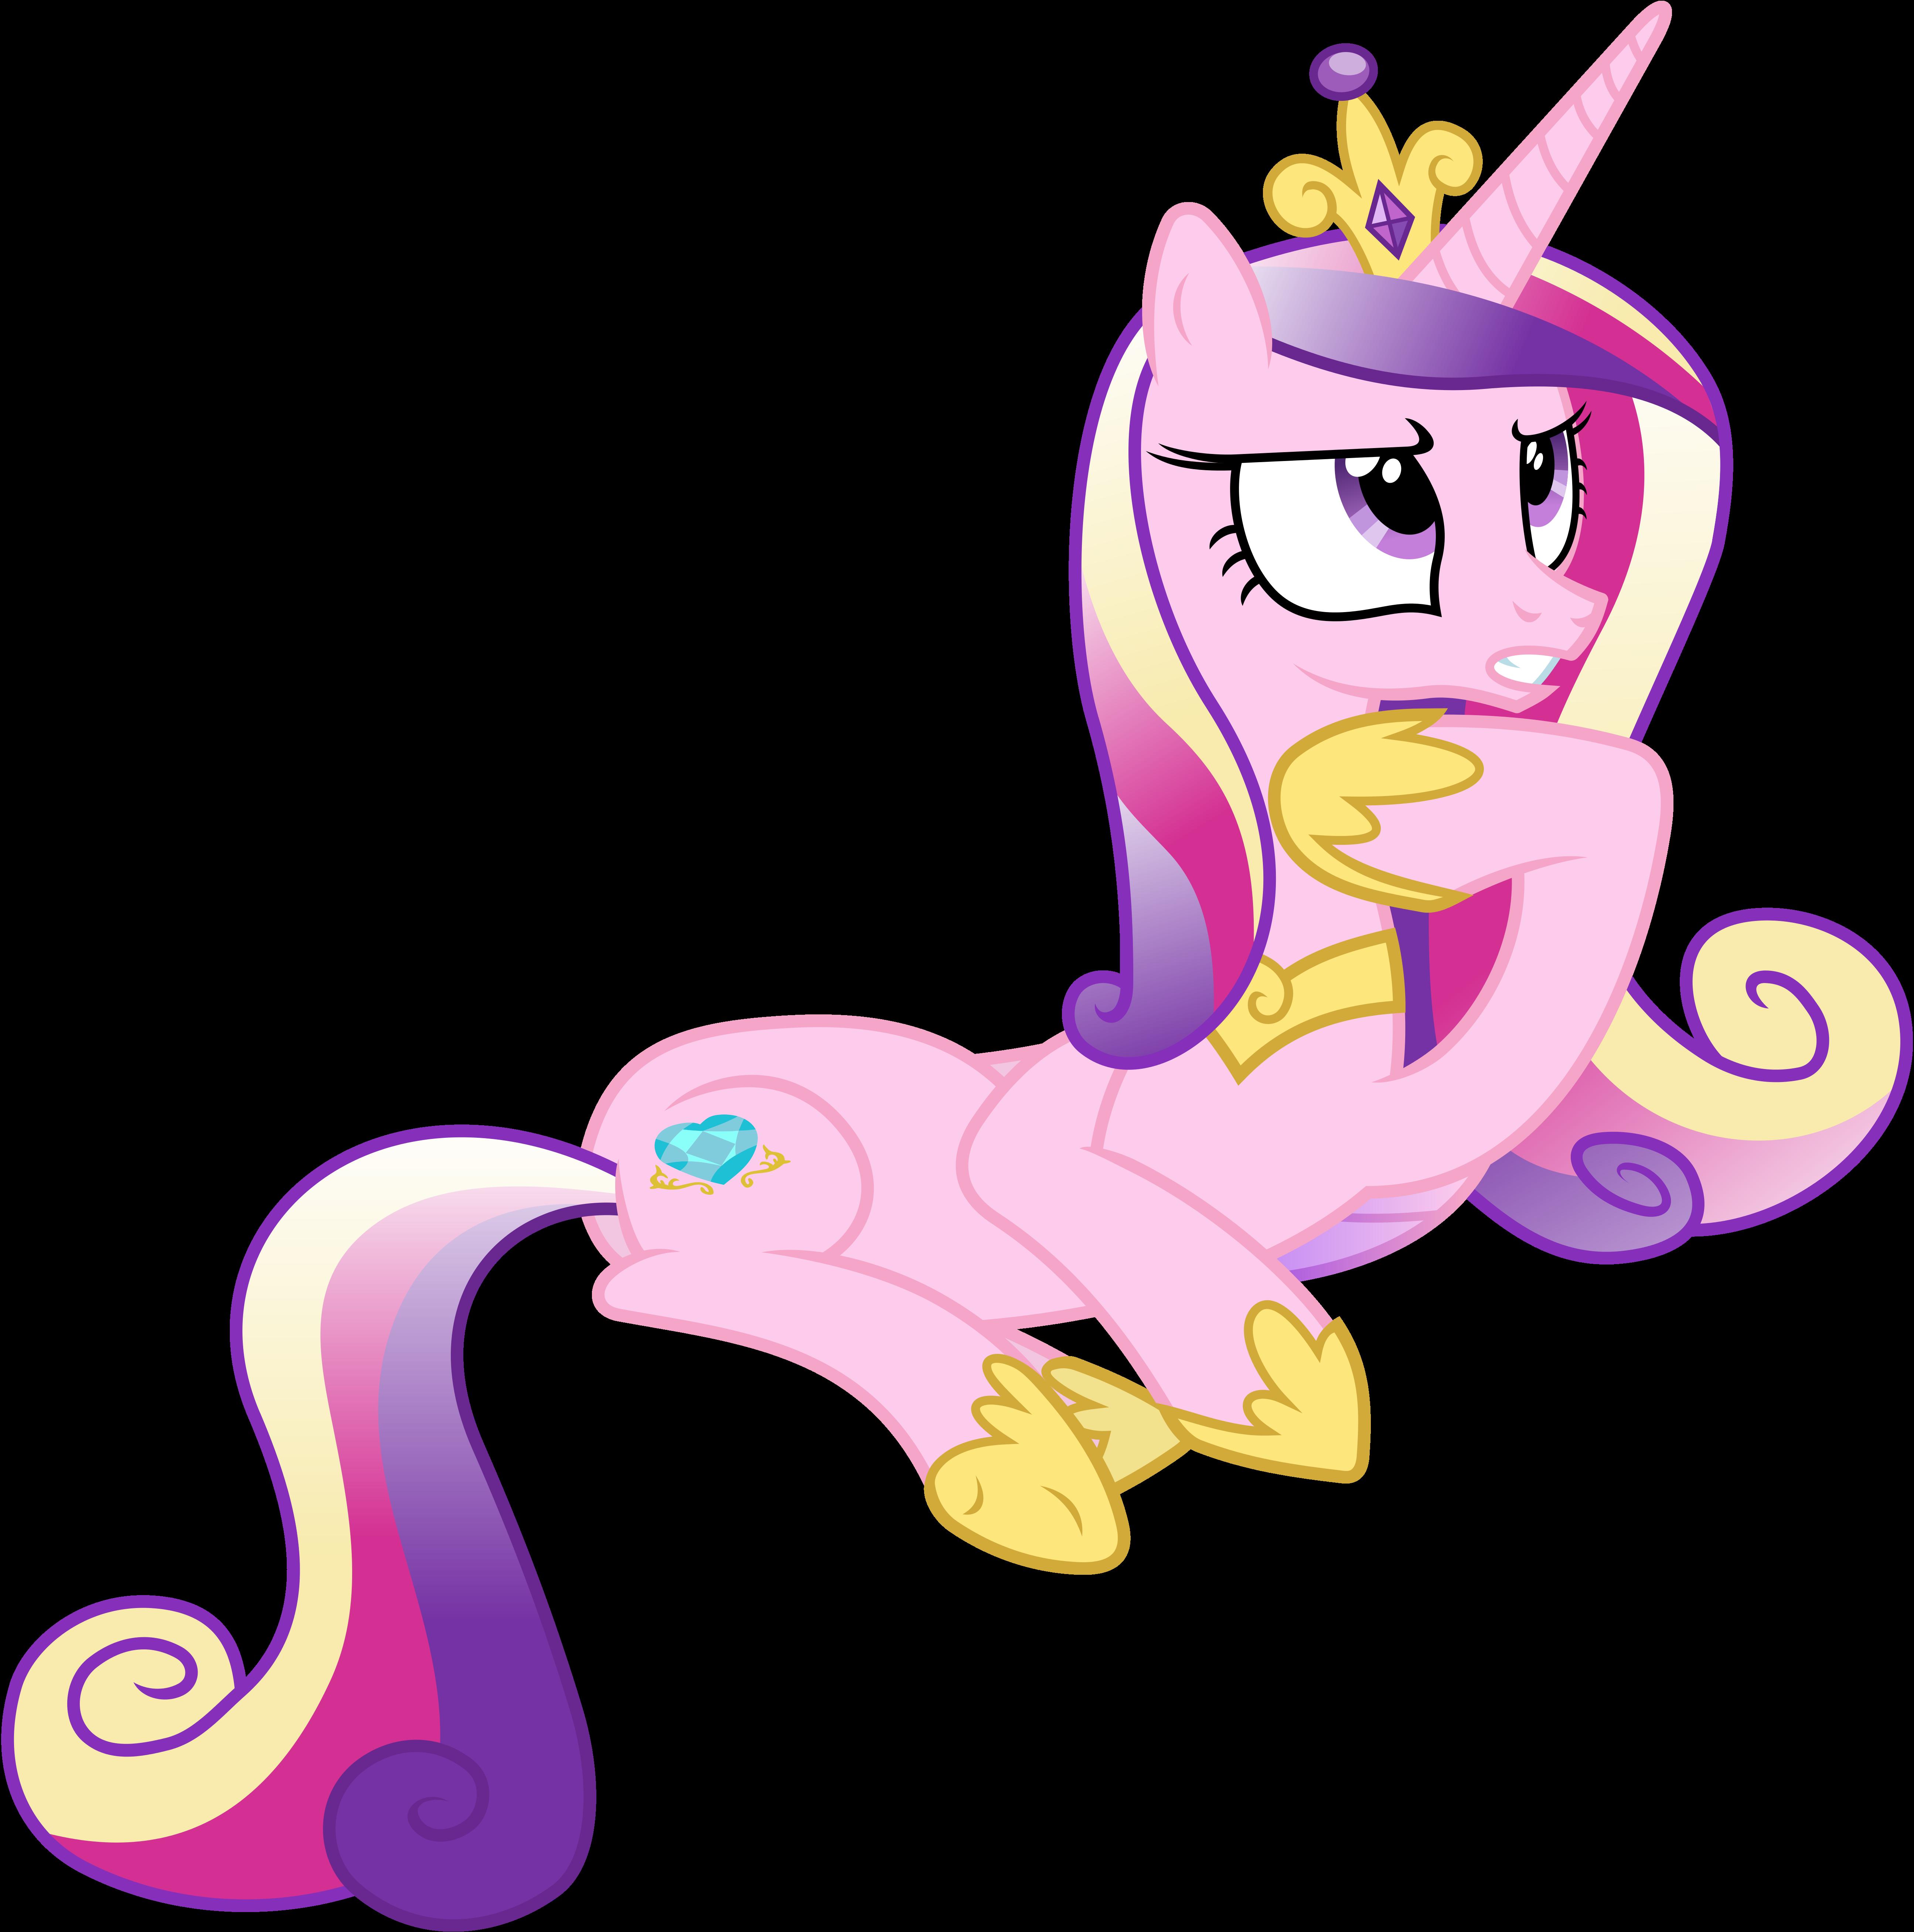 Princess cadance thinking by 90sigma on deviantart - Princesse cadance ...